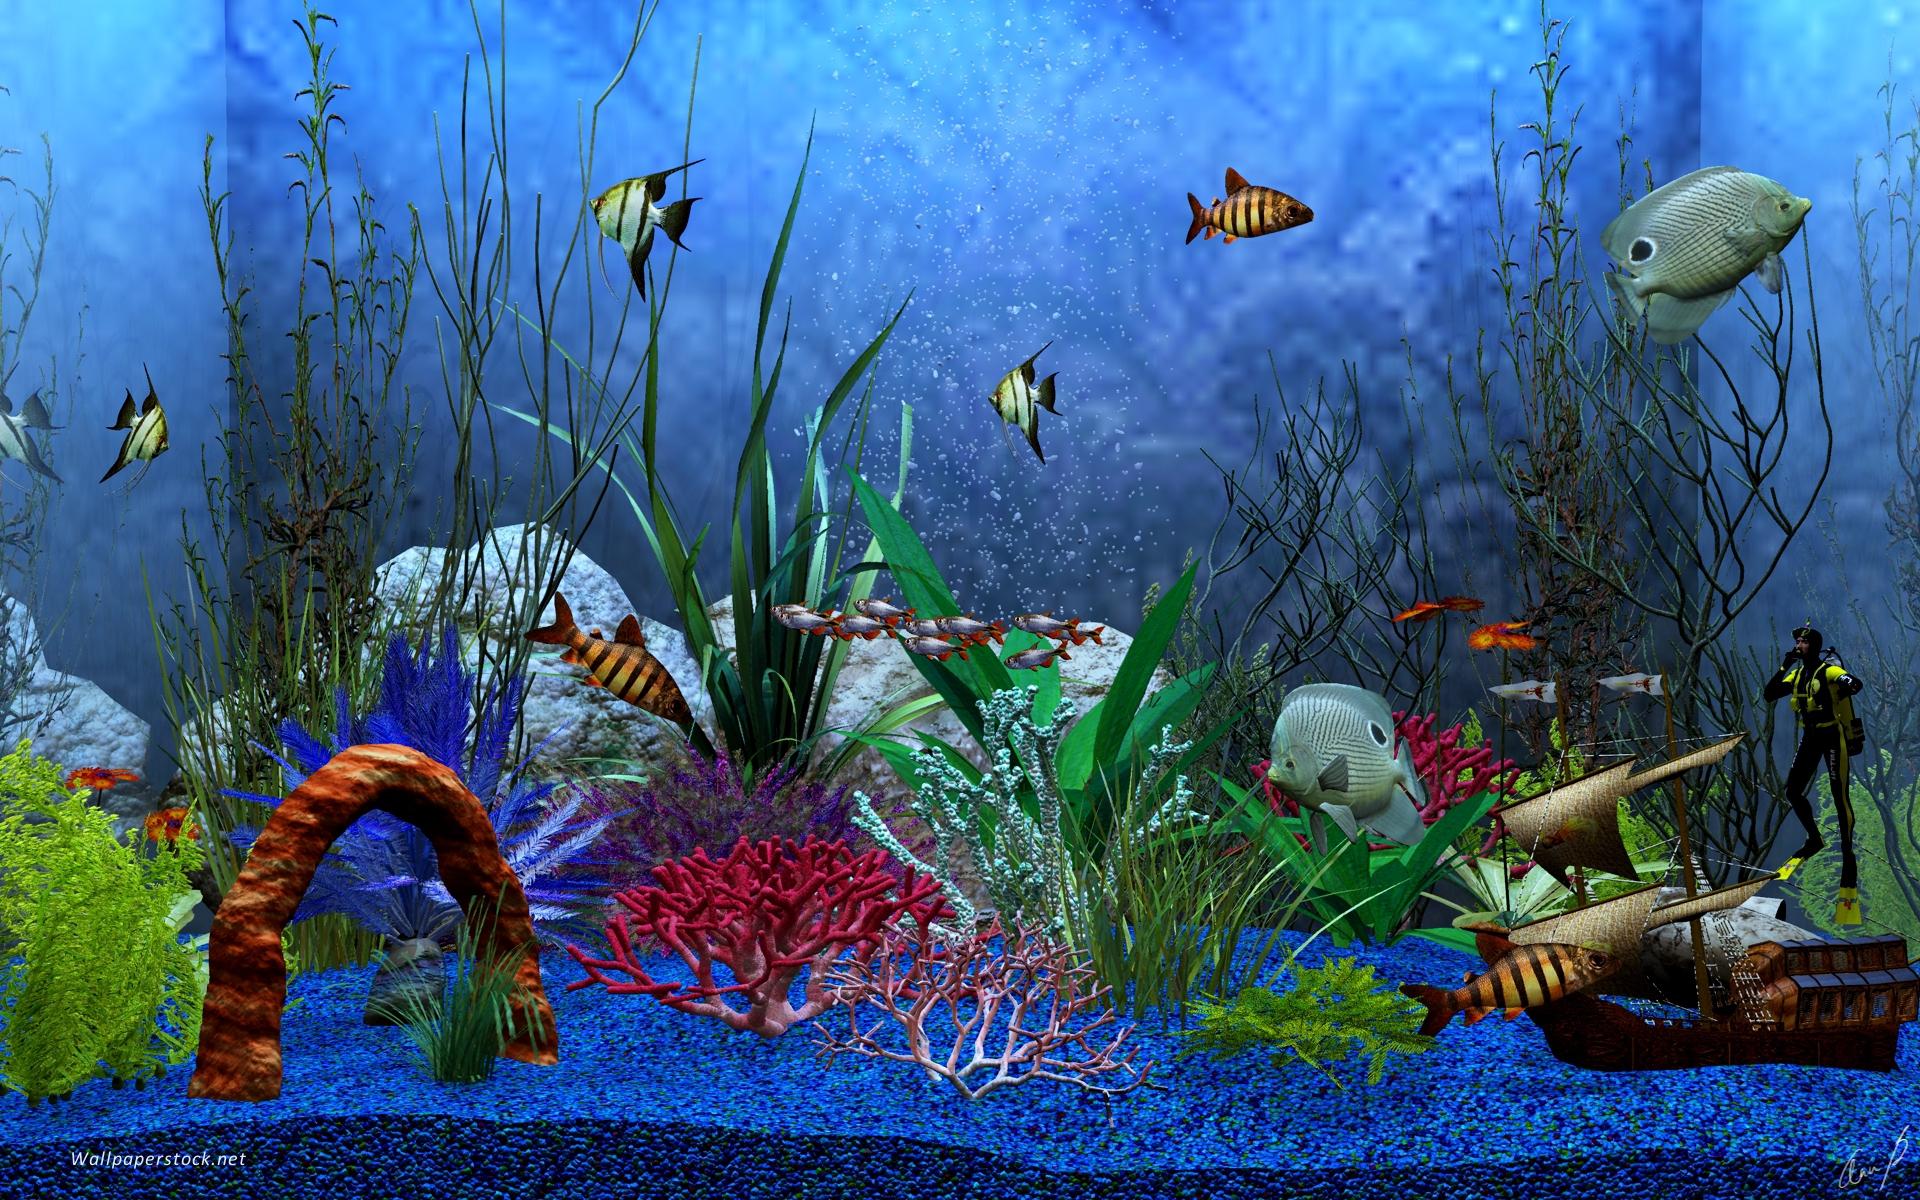 Fish in aquarium desktop wallpaper - Animated Aquarium Desktop Wallpaper Www Wallpapers In Hd Com